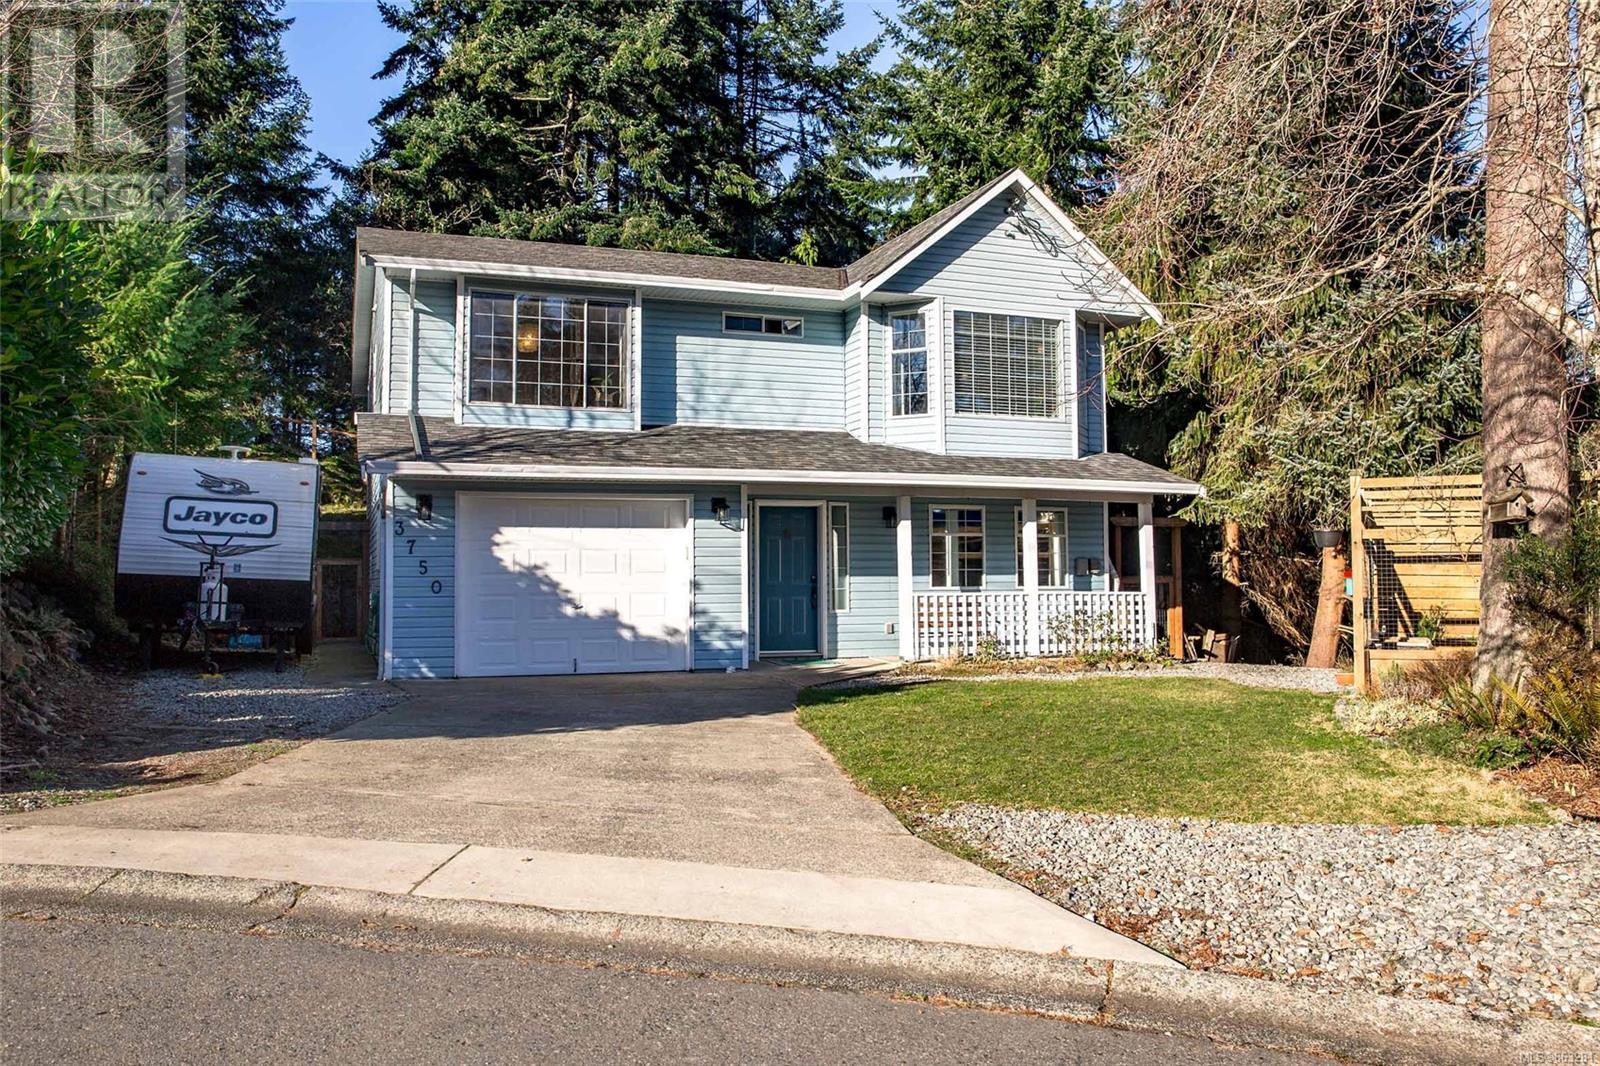 3750 Myrta Pl, Nanaimo, British Columbia  V9T 5R5 - Photo 1 - 863281